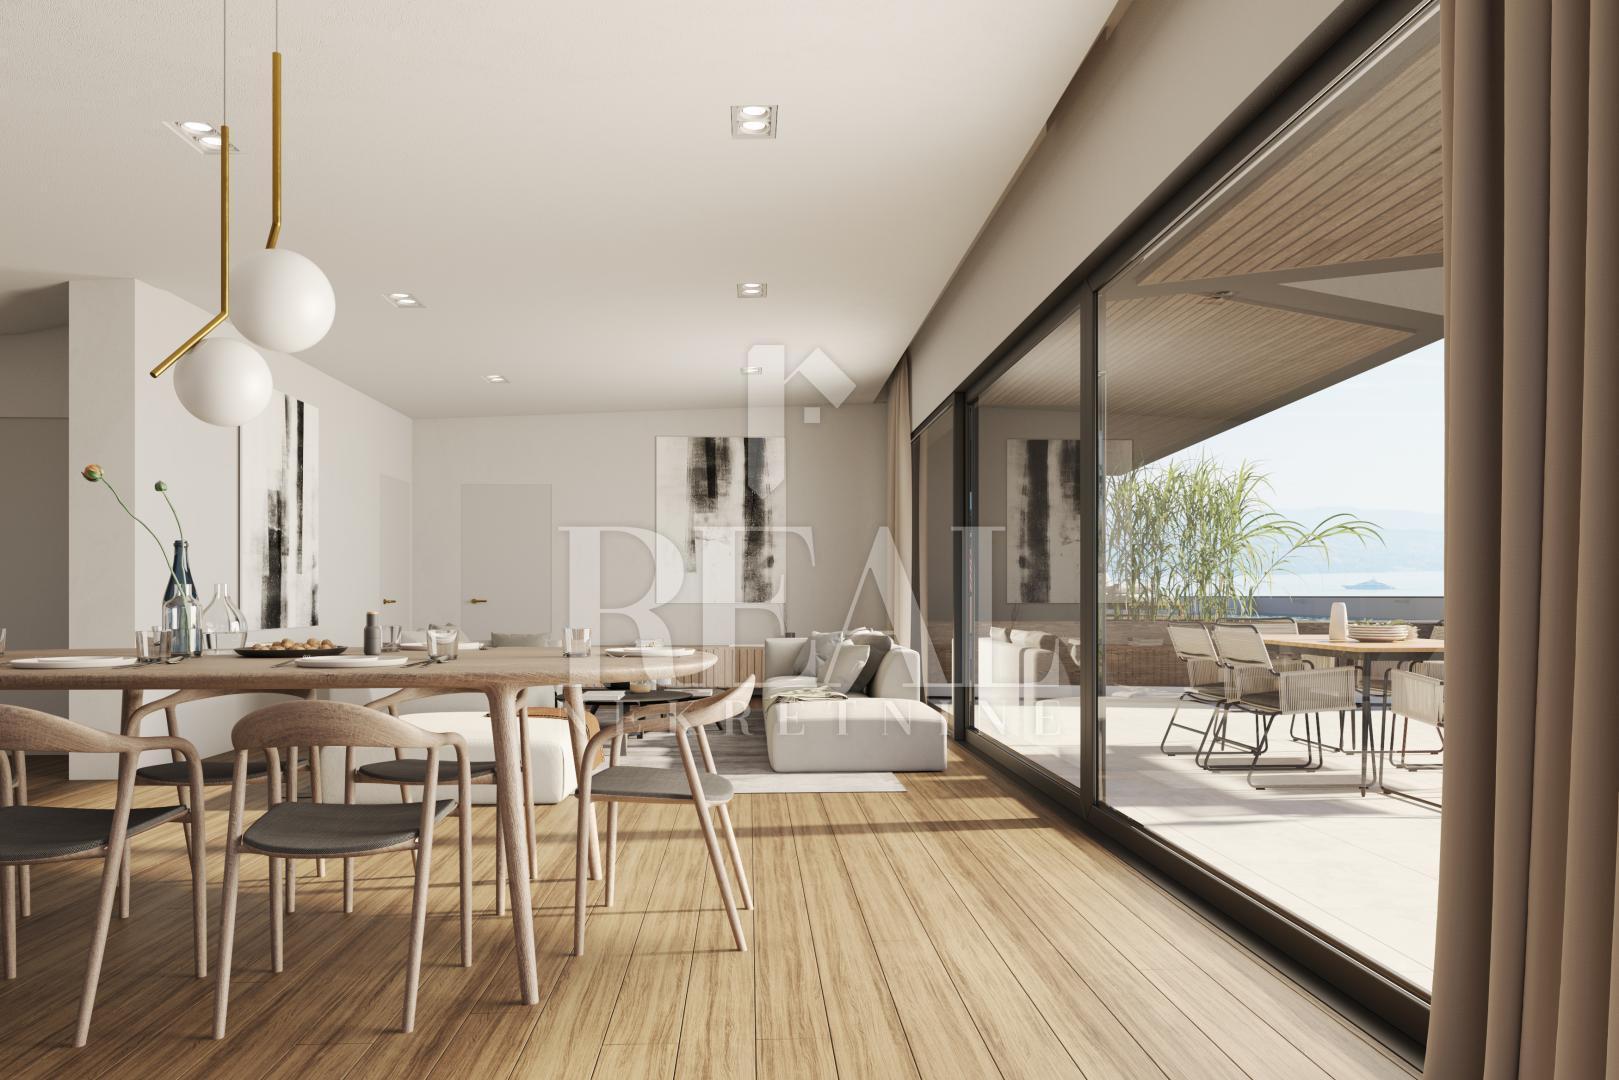 Penthouse sa bazenom na terasi i predivnim pogledom na Kvarner od 170,5 m2